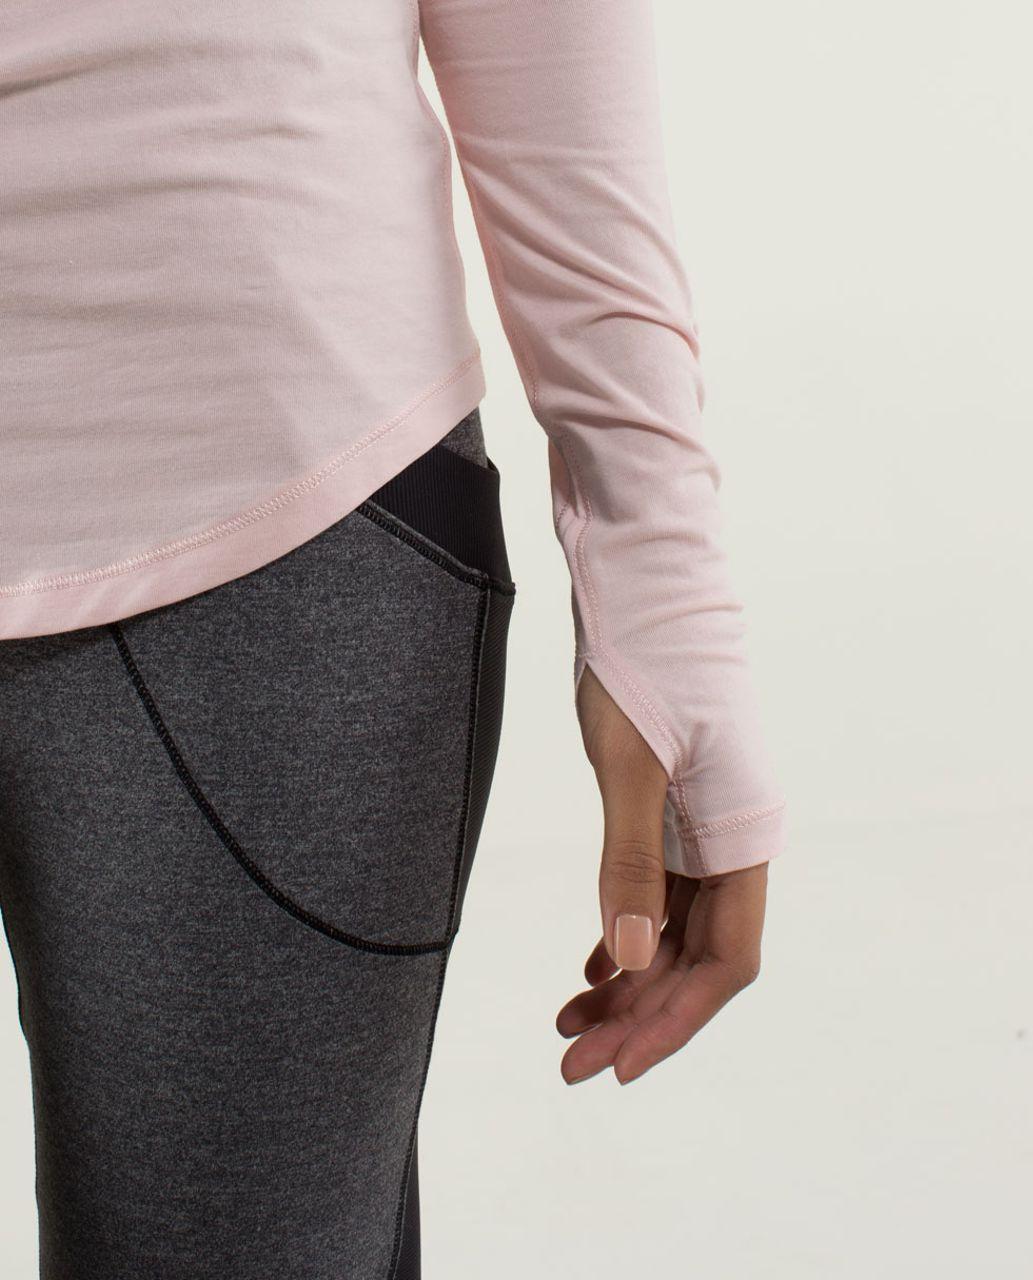 Lululemon Karma Long Sleeve - Pretty Pink